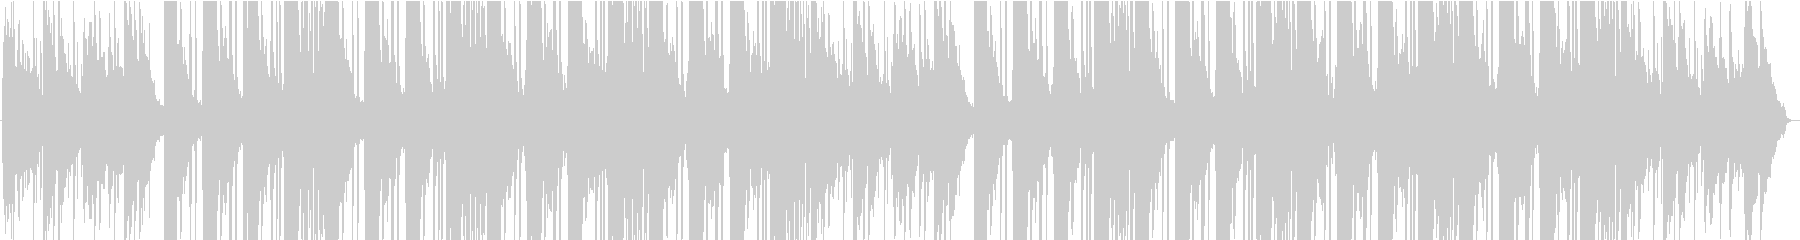 【Lo-Fi】ピアノのローファイサウンドの未再生の波形